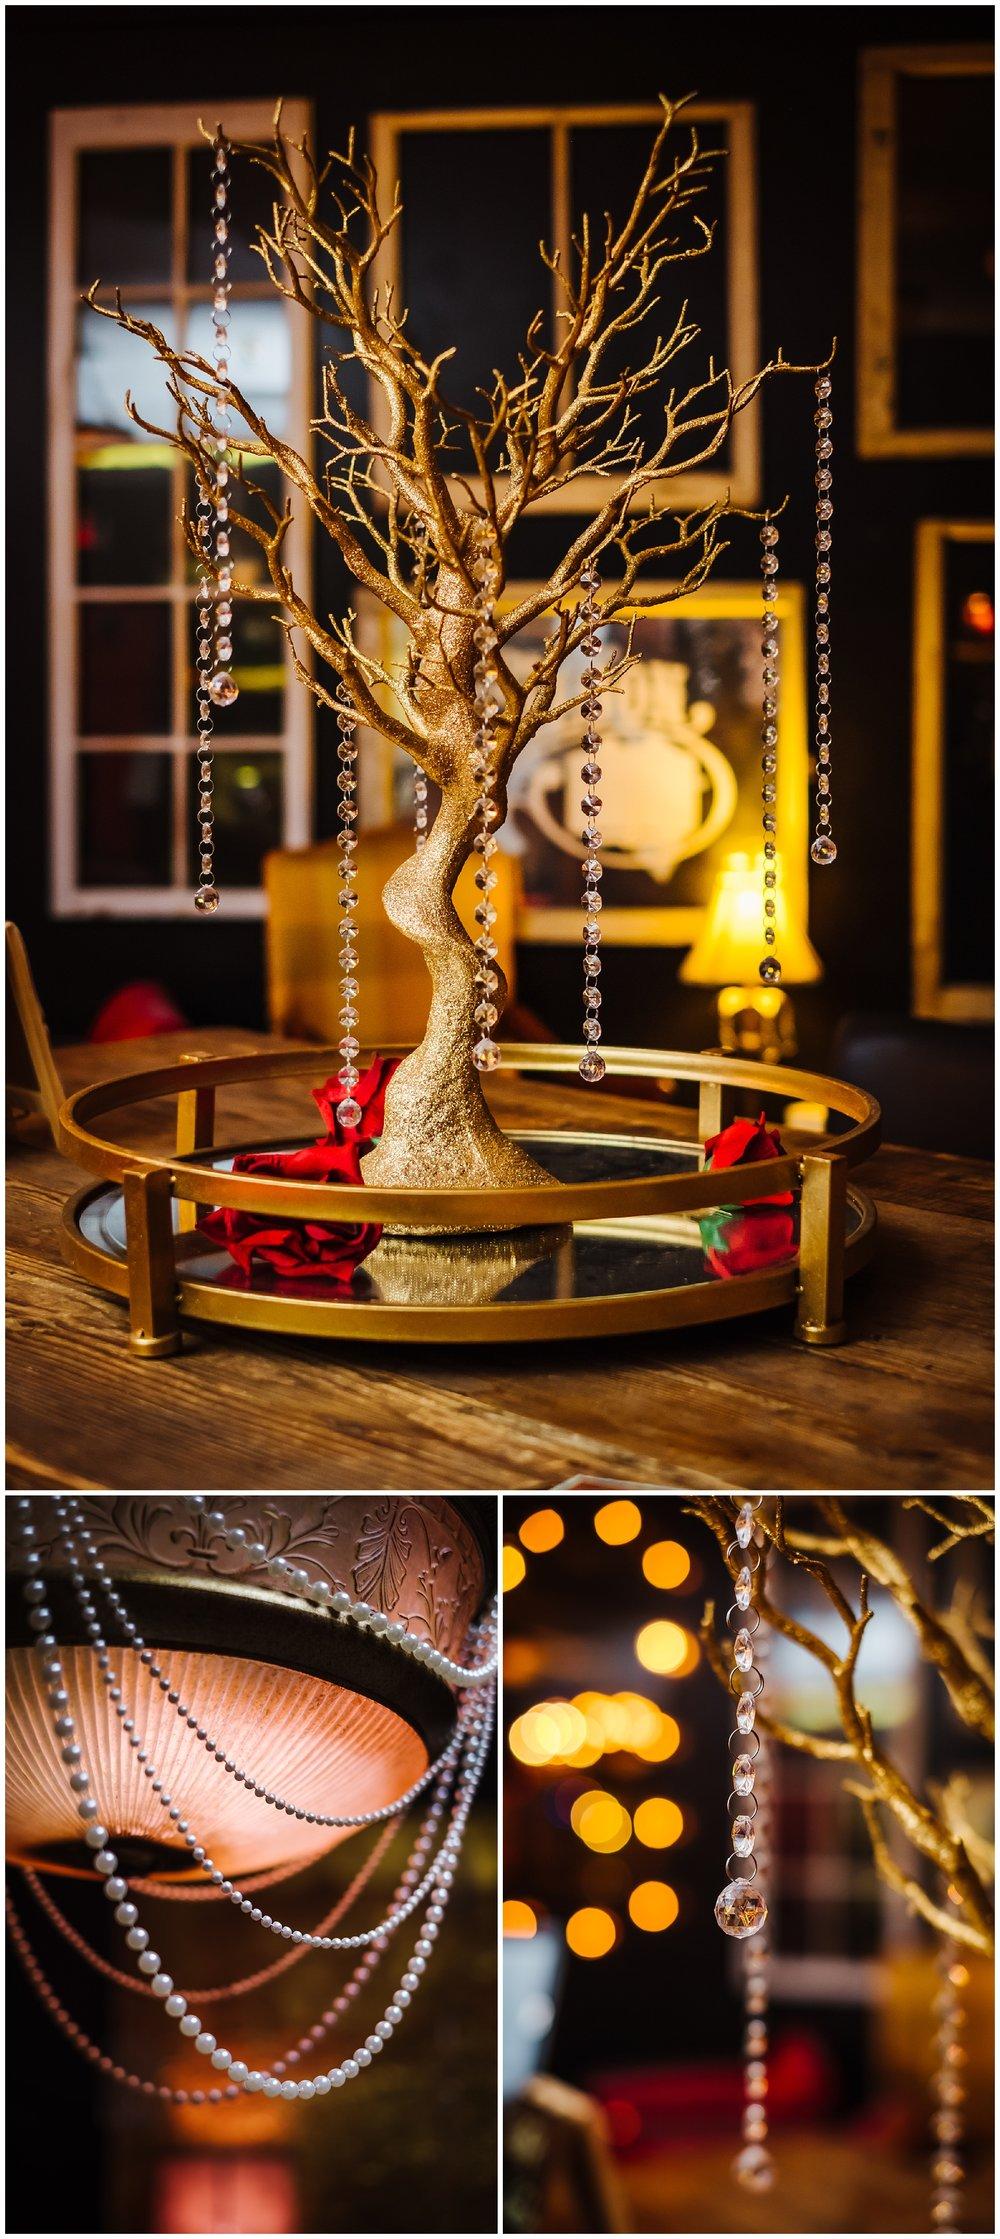 tampa-wedding-photographer-unique-indoor-venue_0014.jpg